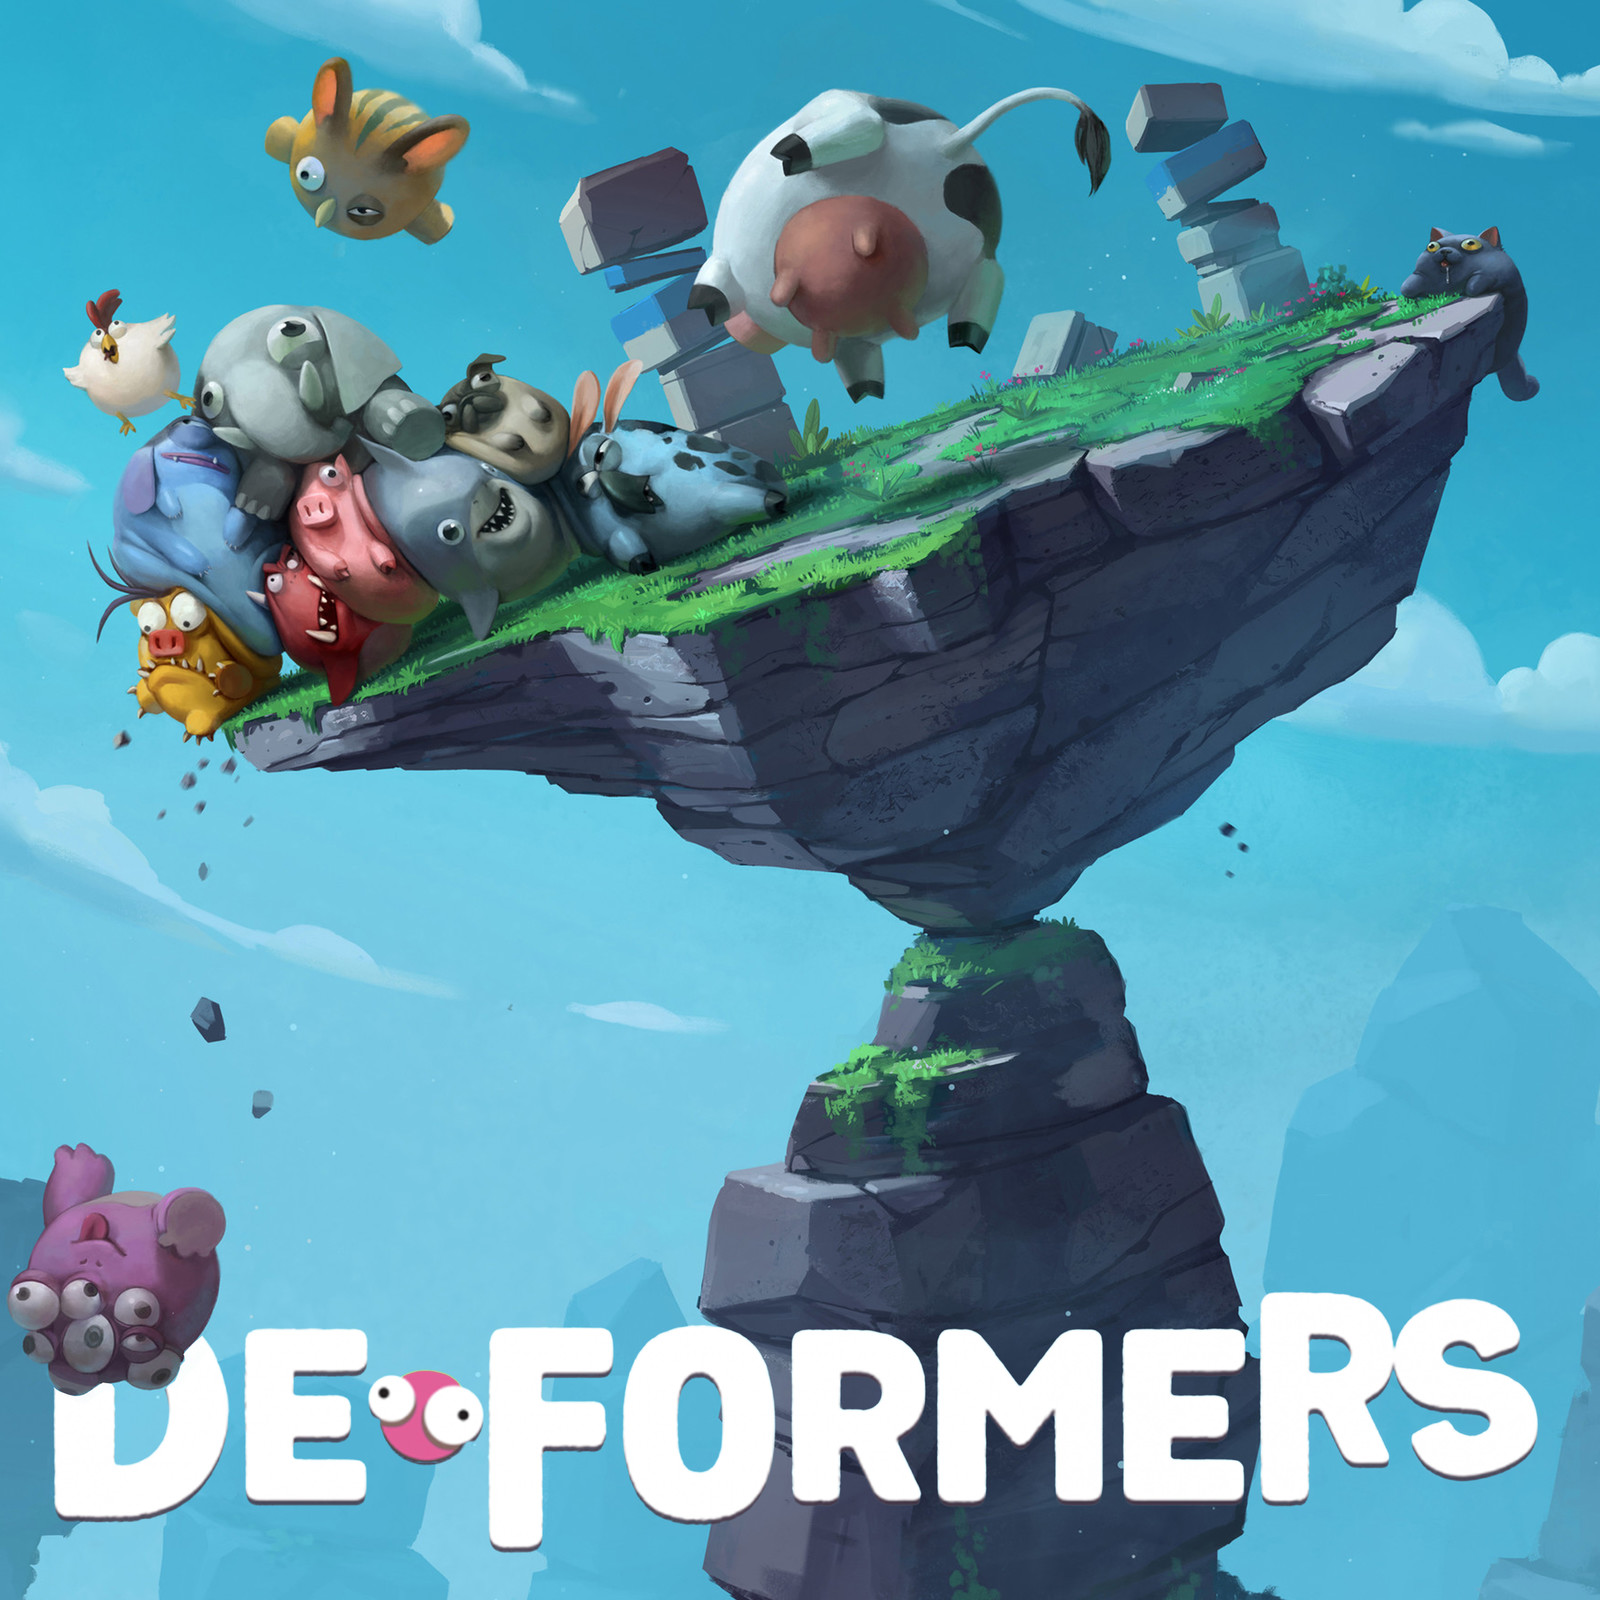 Deformers Promo Art